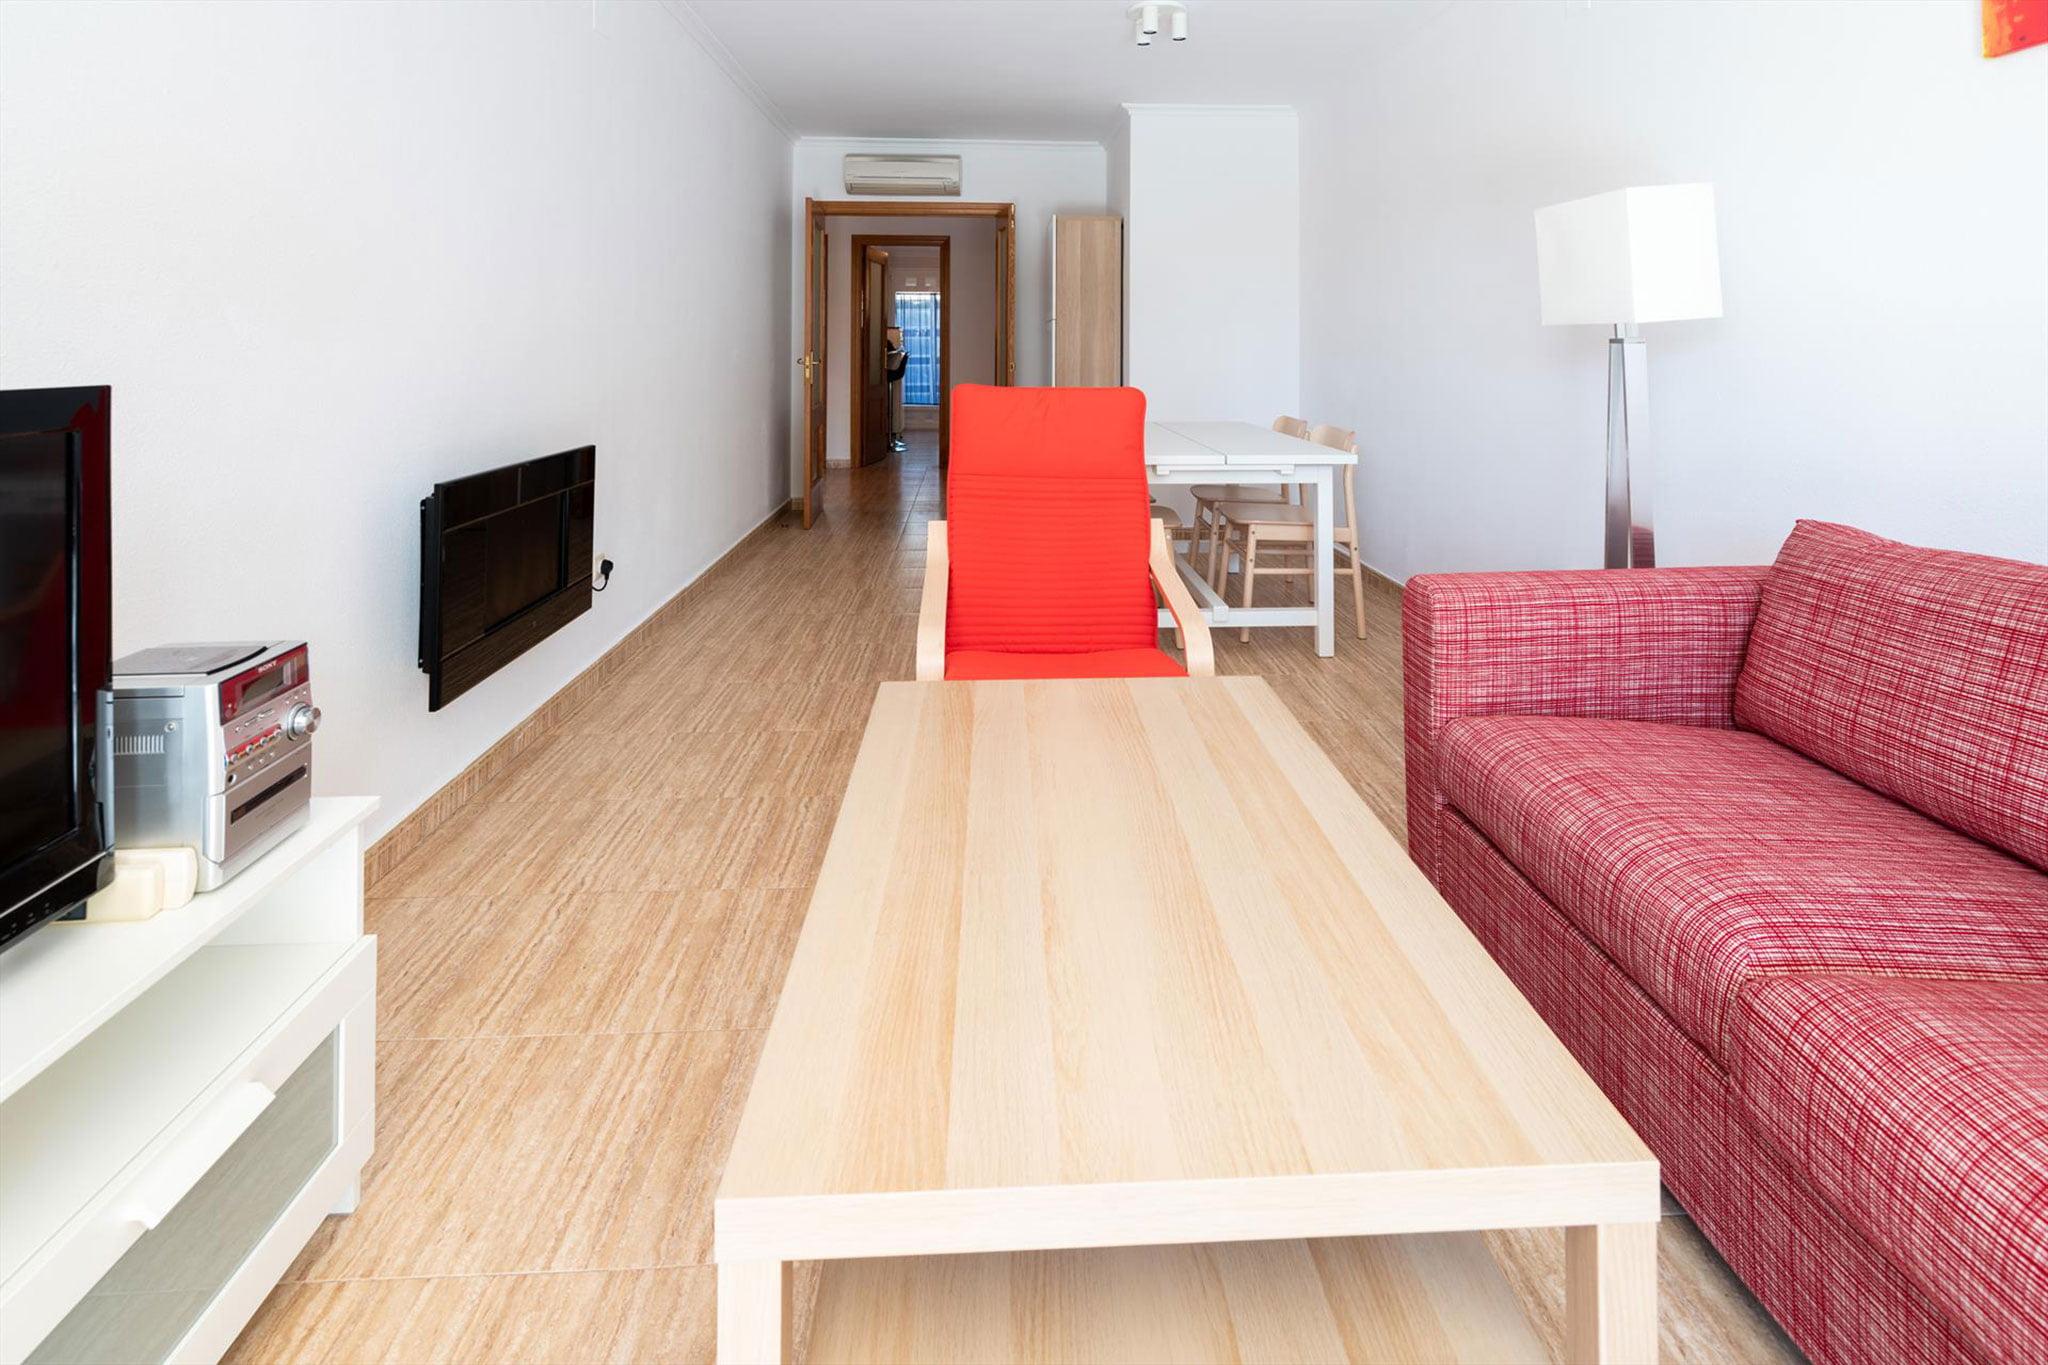 Salón de un apartamento de alquiler en Jávea – Quality Rent a Villa